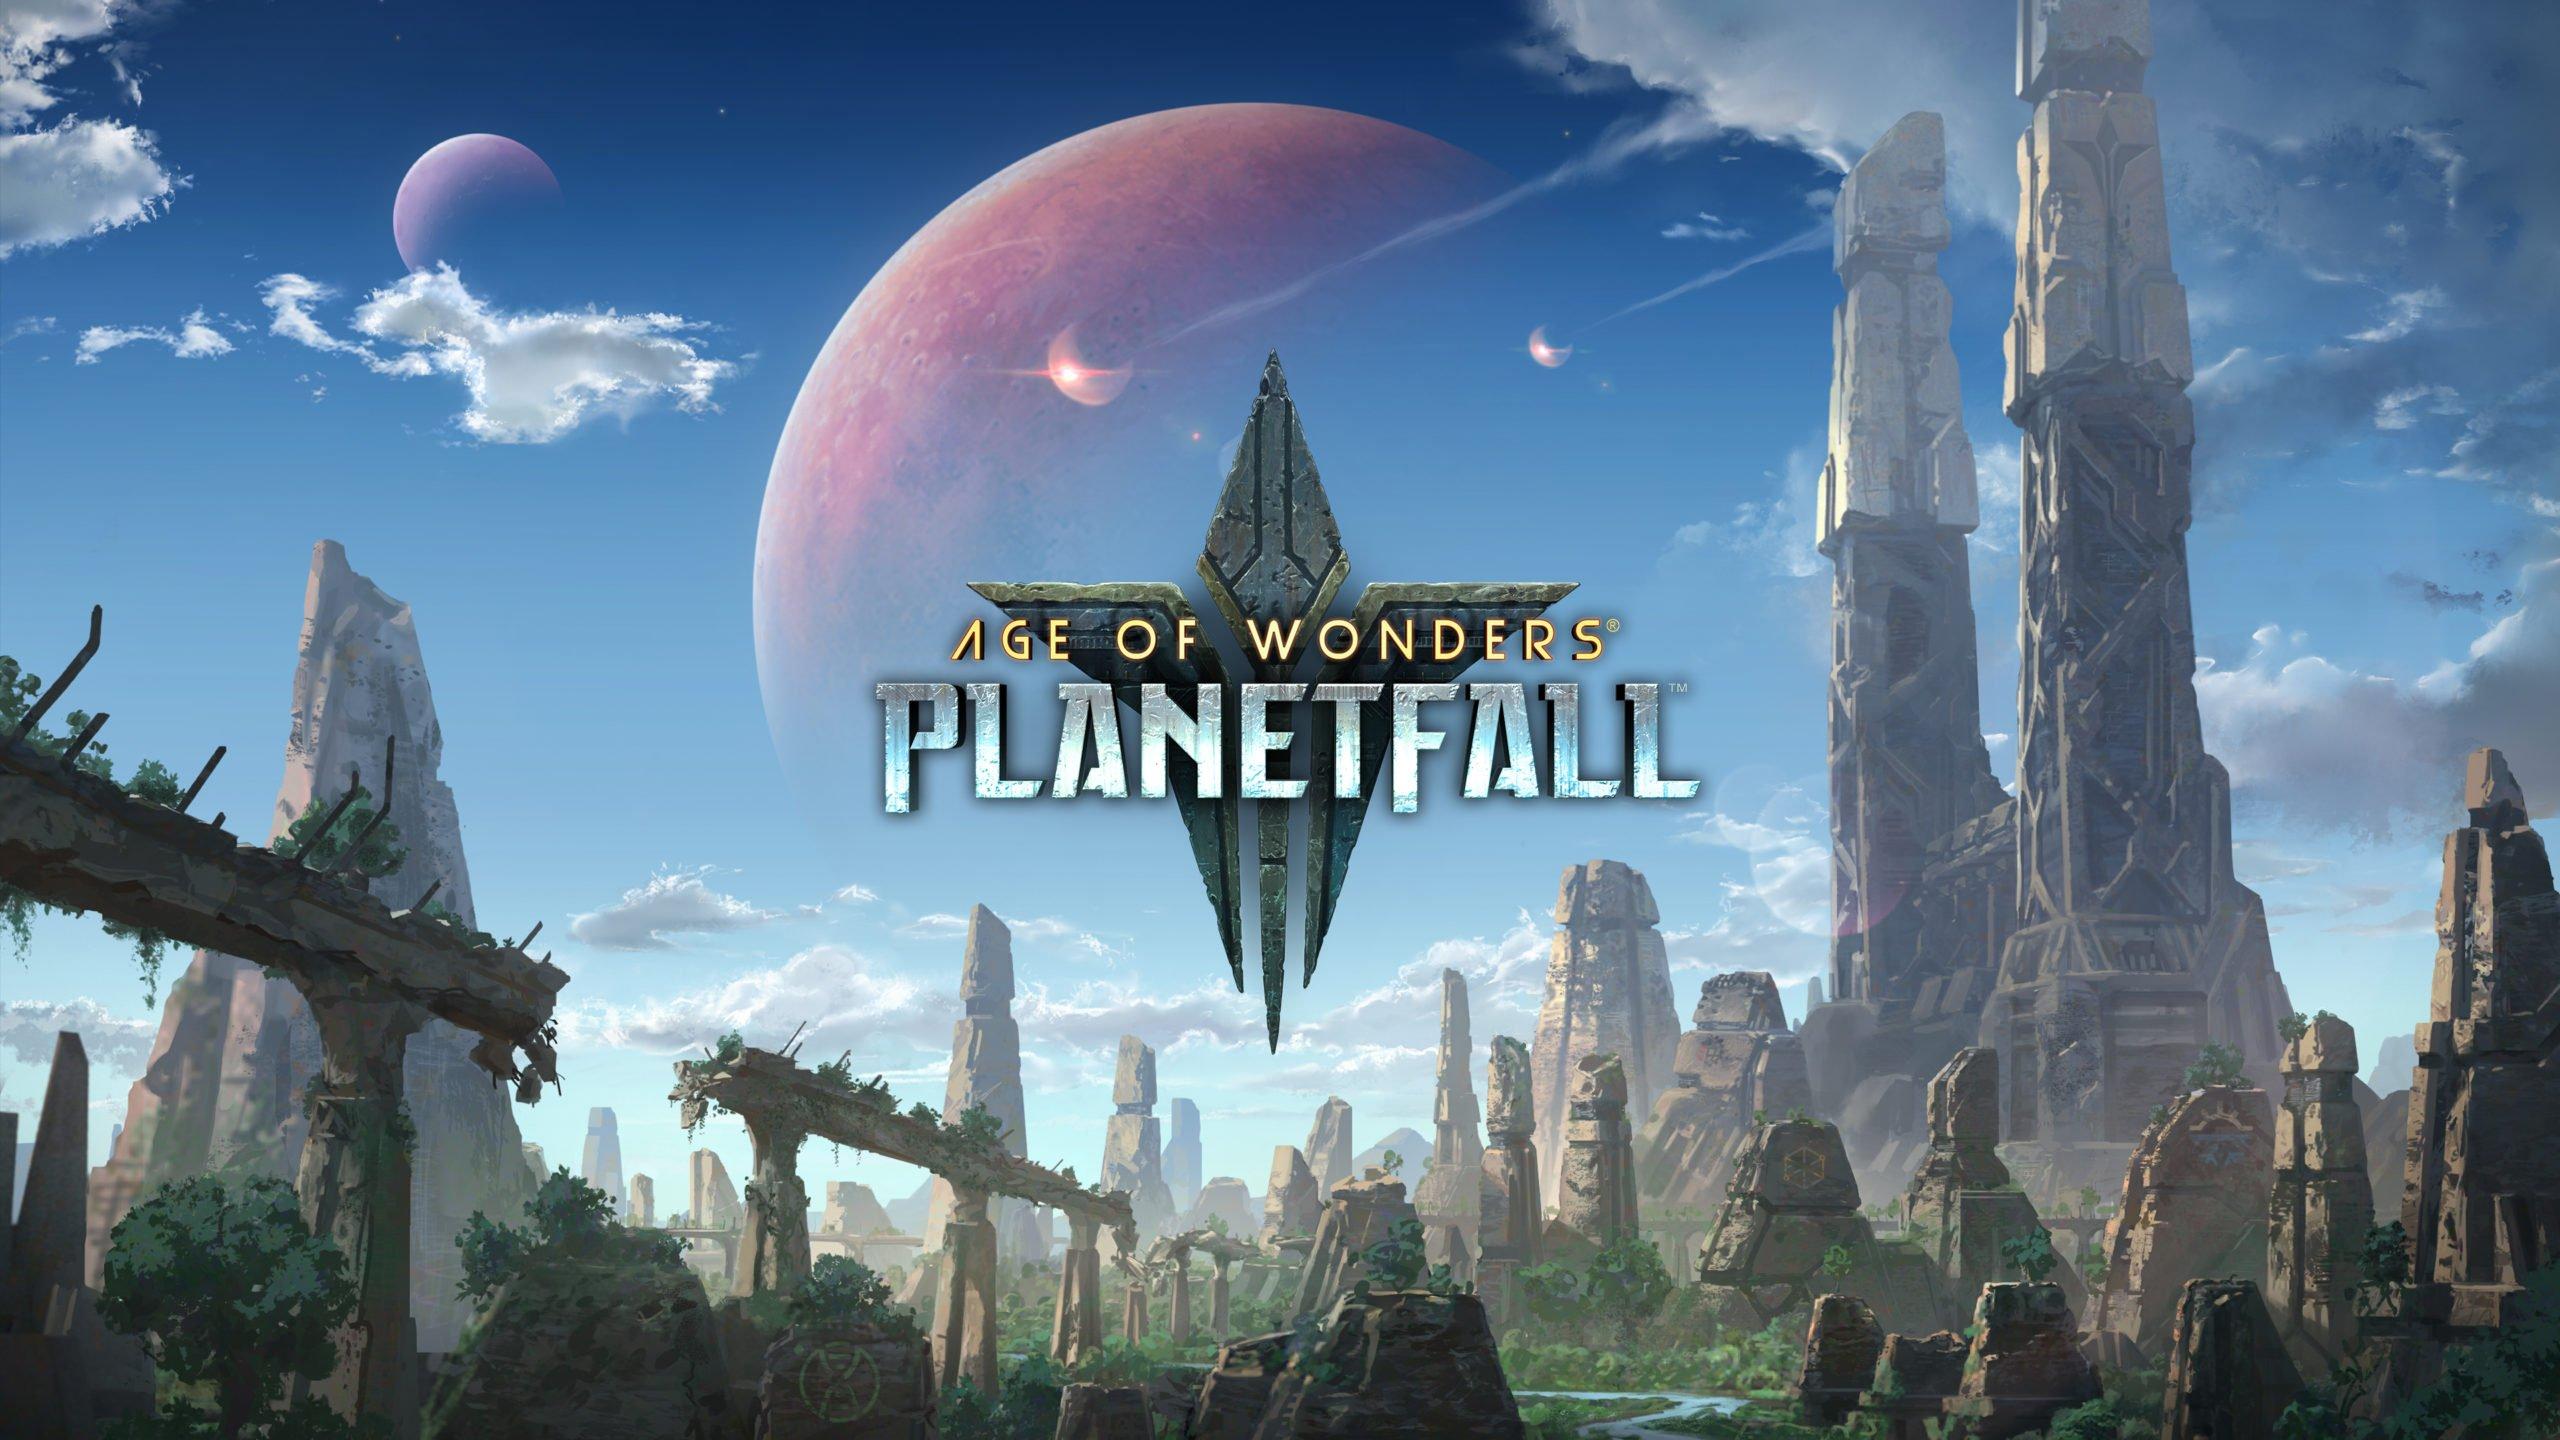 Age_Of_Wonders_Planetfall_Wallpaper_PLANETFALL